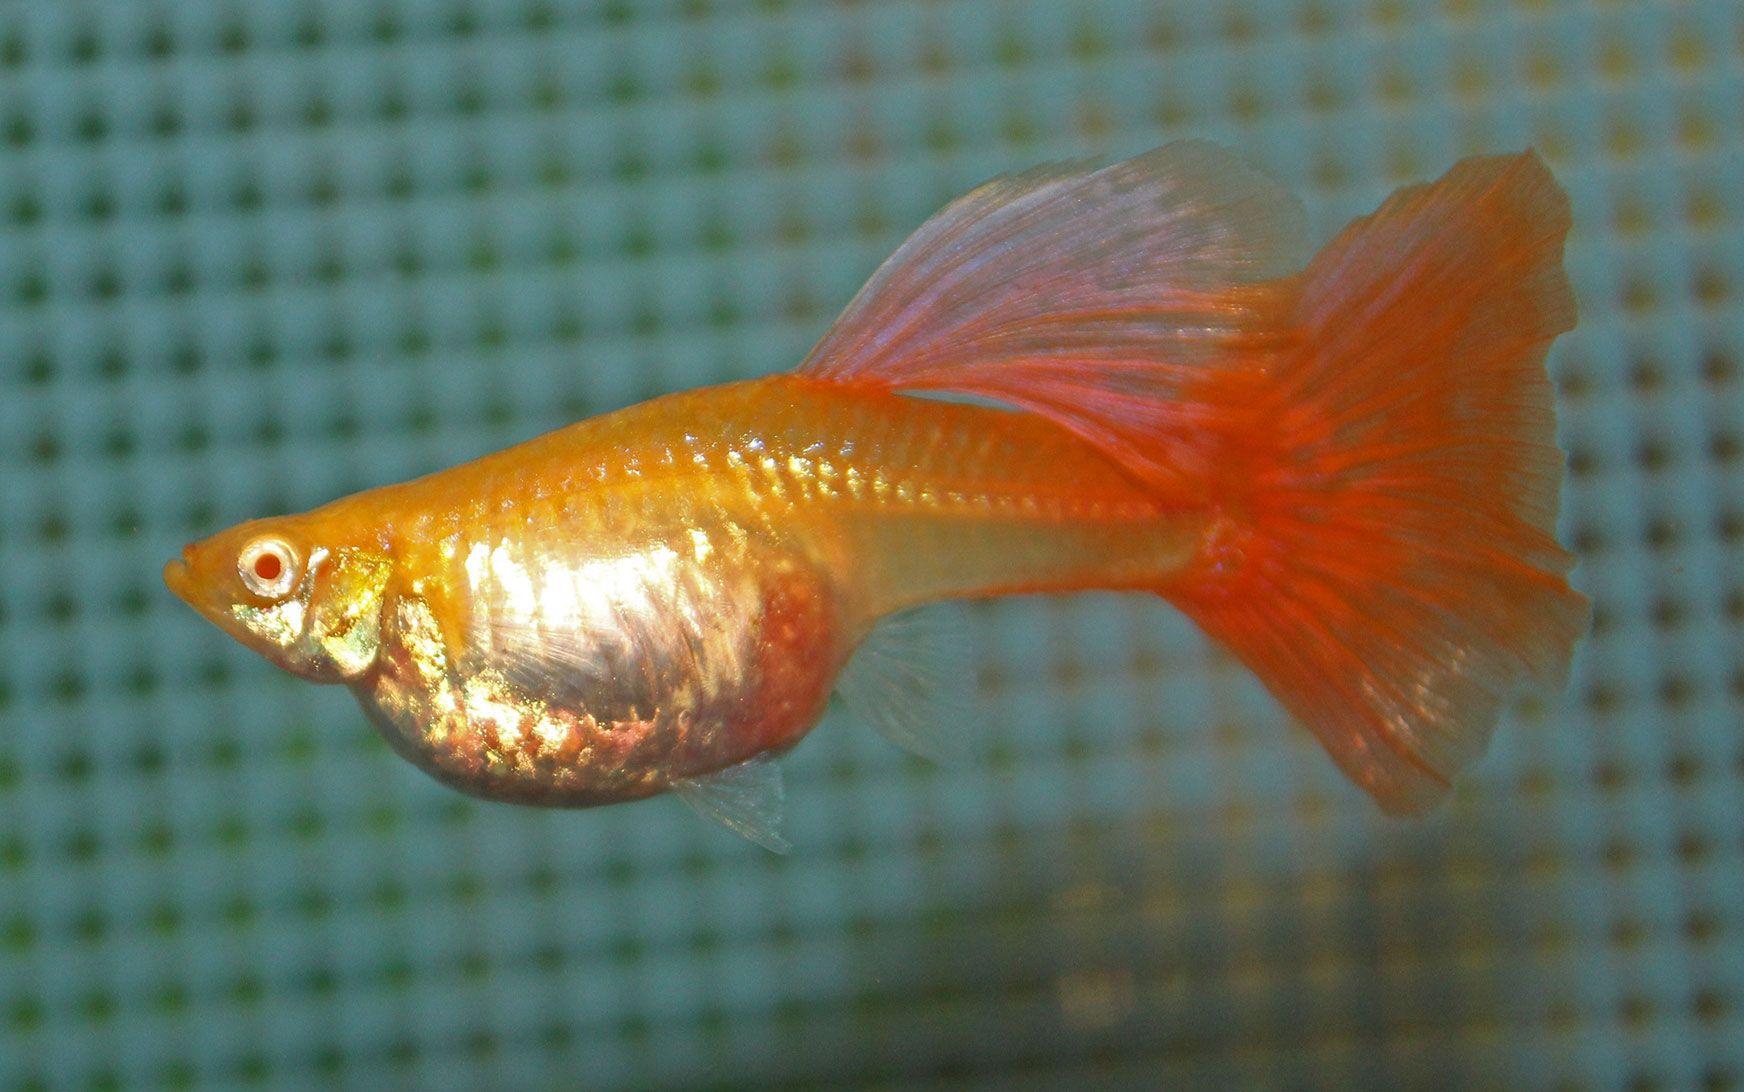 Female Guppy Guppy Fish Betta Aquarium Fresh Water Fish Tank